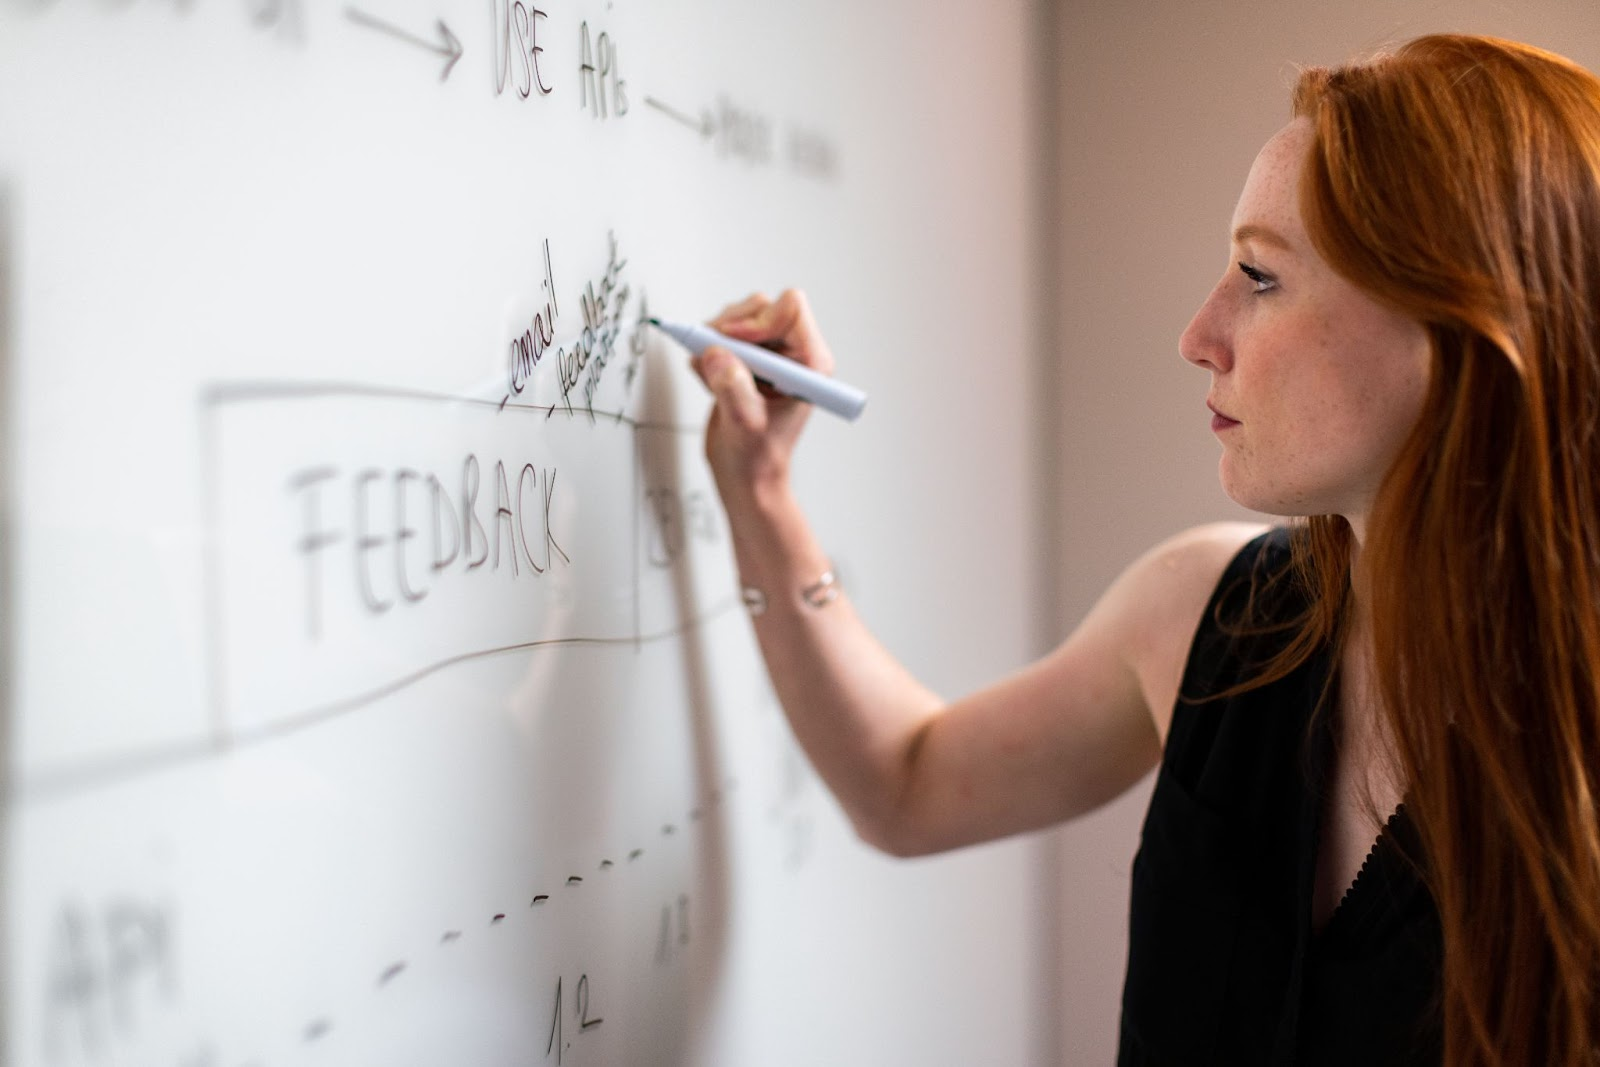 a woman gives feedback